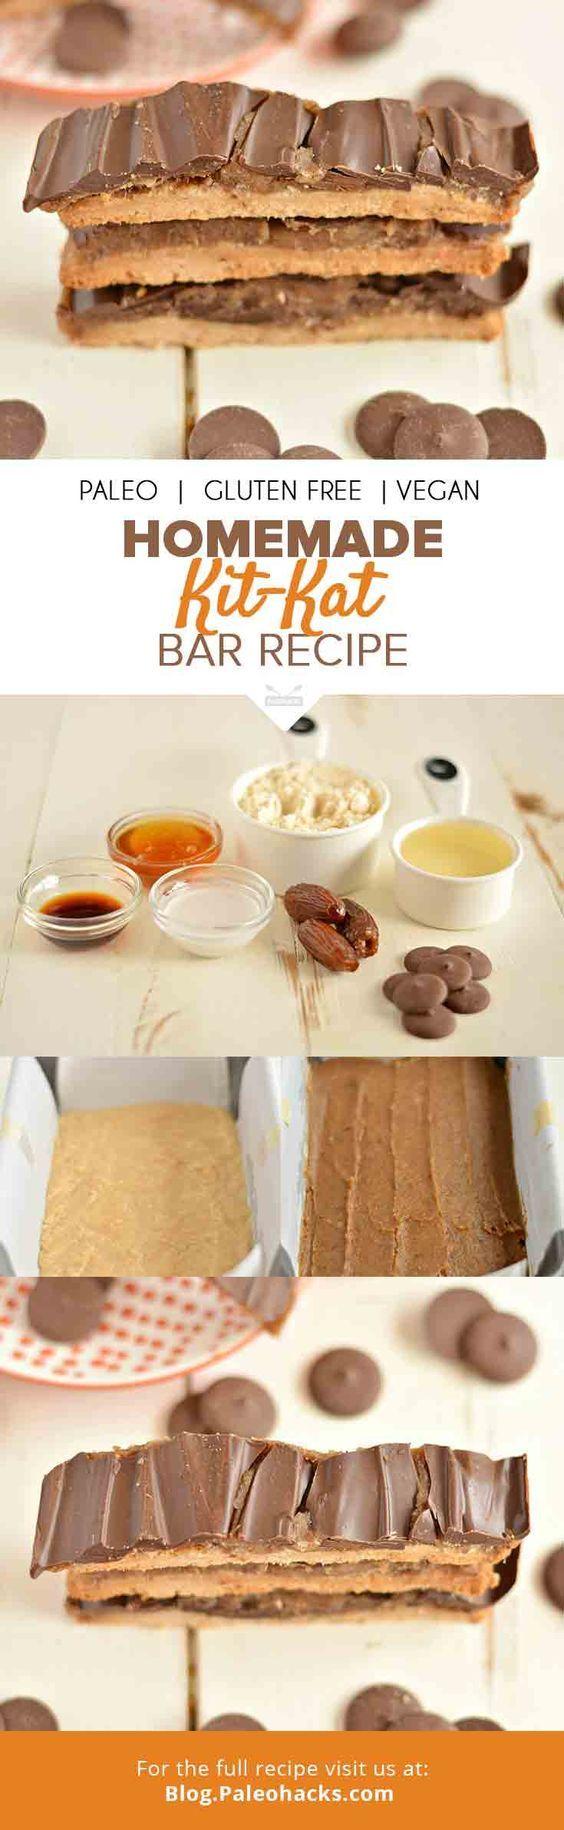 "gluten-free grain-free paleo dessert recipe (""kit kat"") Maybe use as a Christmas time goodie"